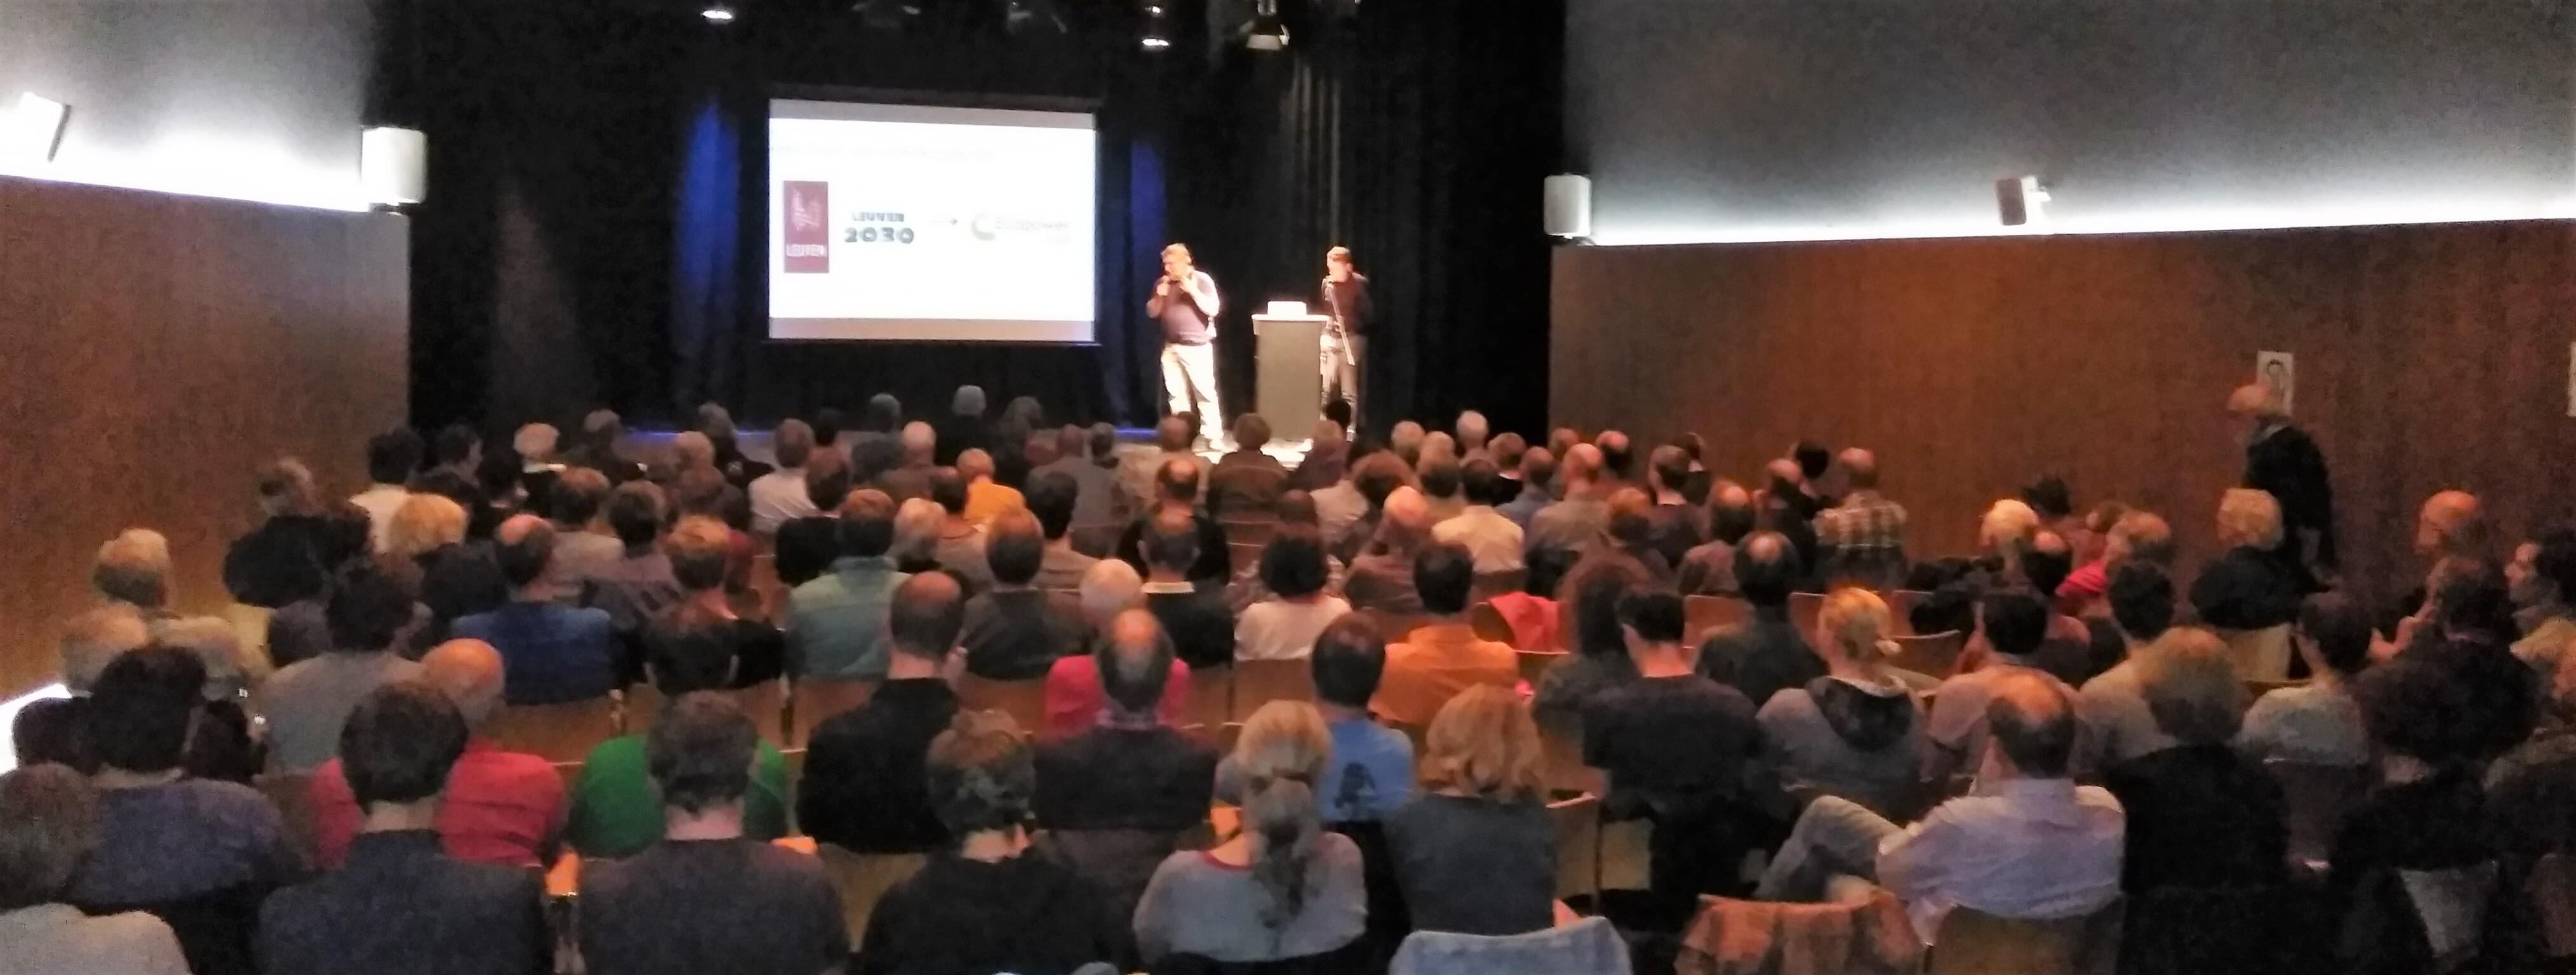 Foto: Energiecafé in Leuven